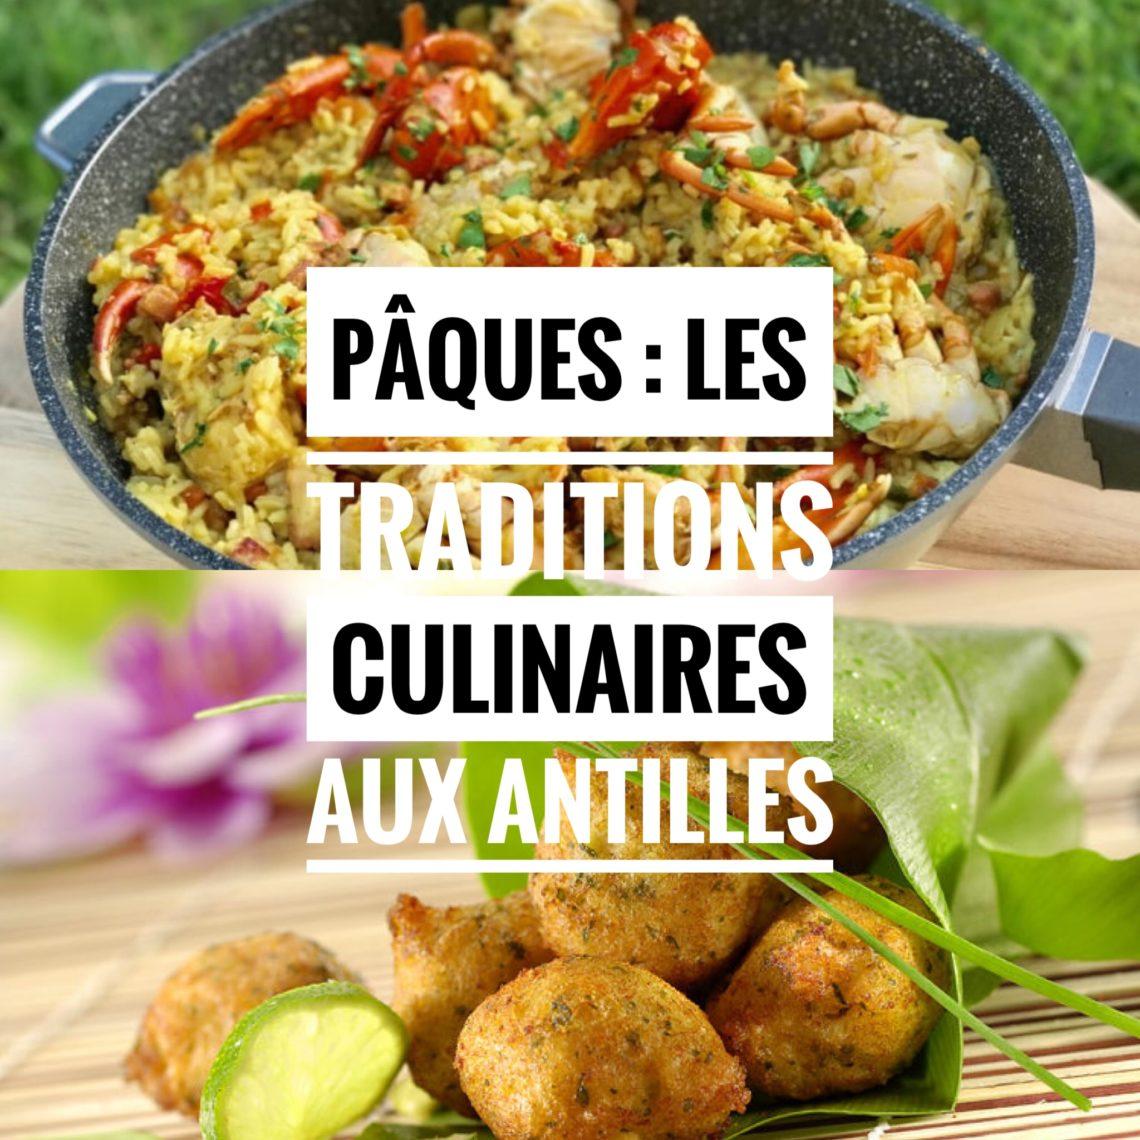 Pâques : Les traditions culinaires aux Antilles